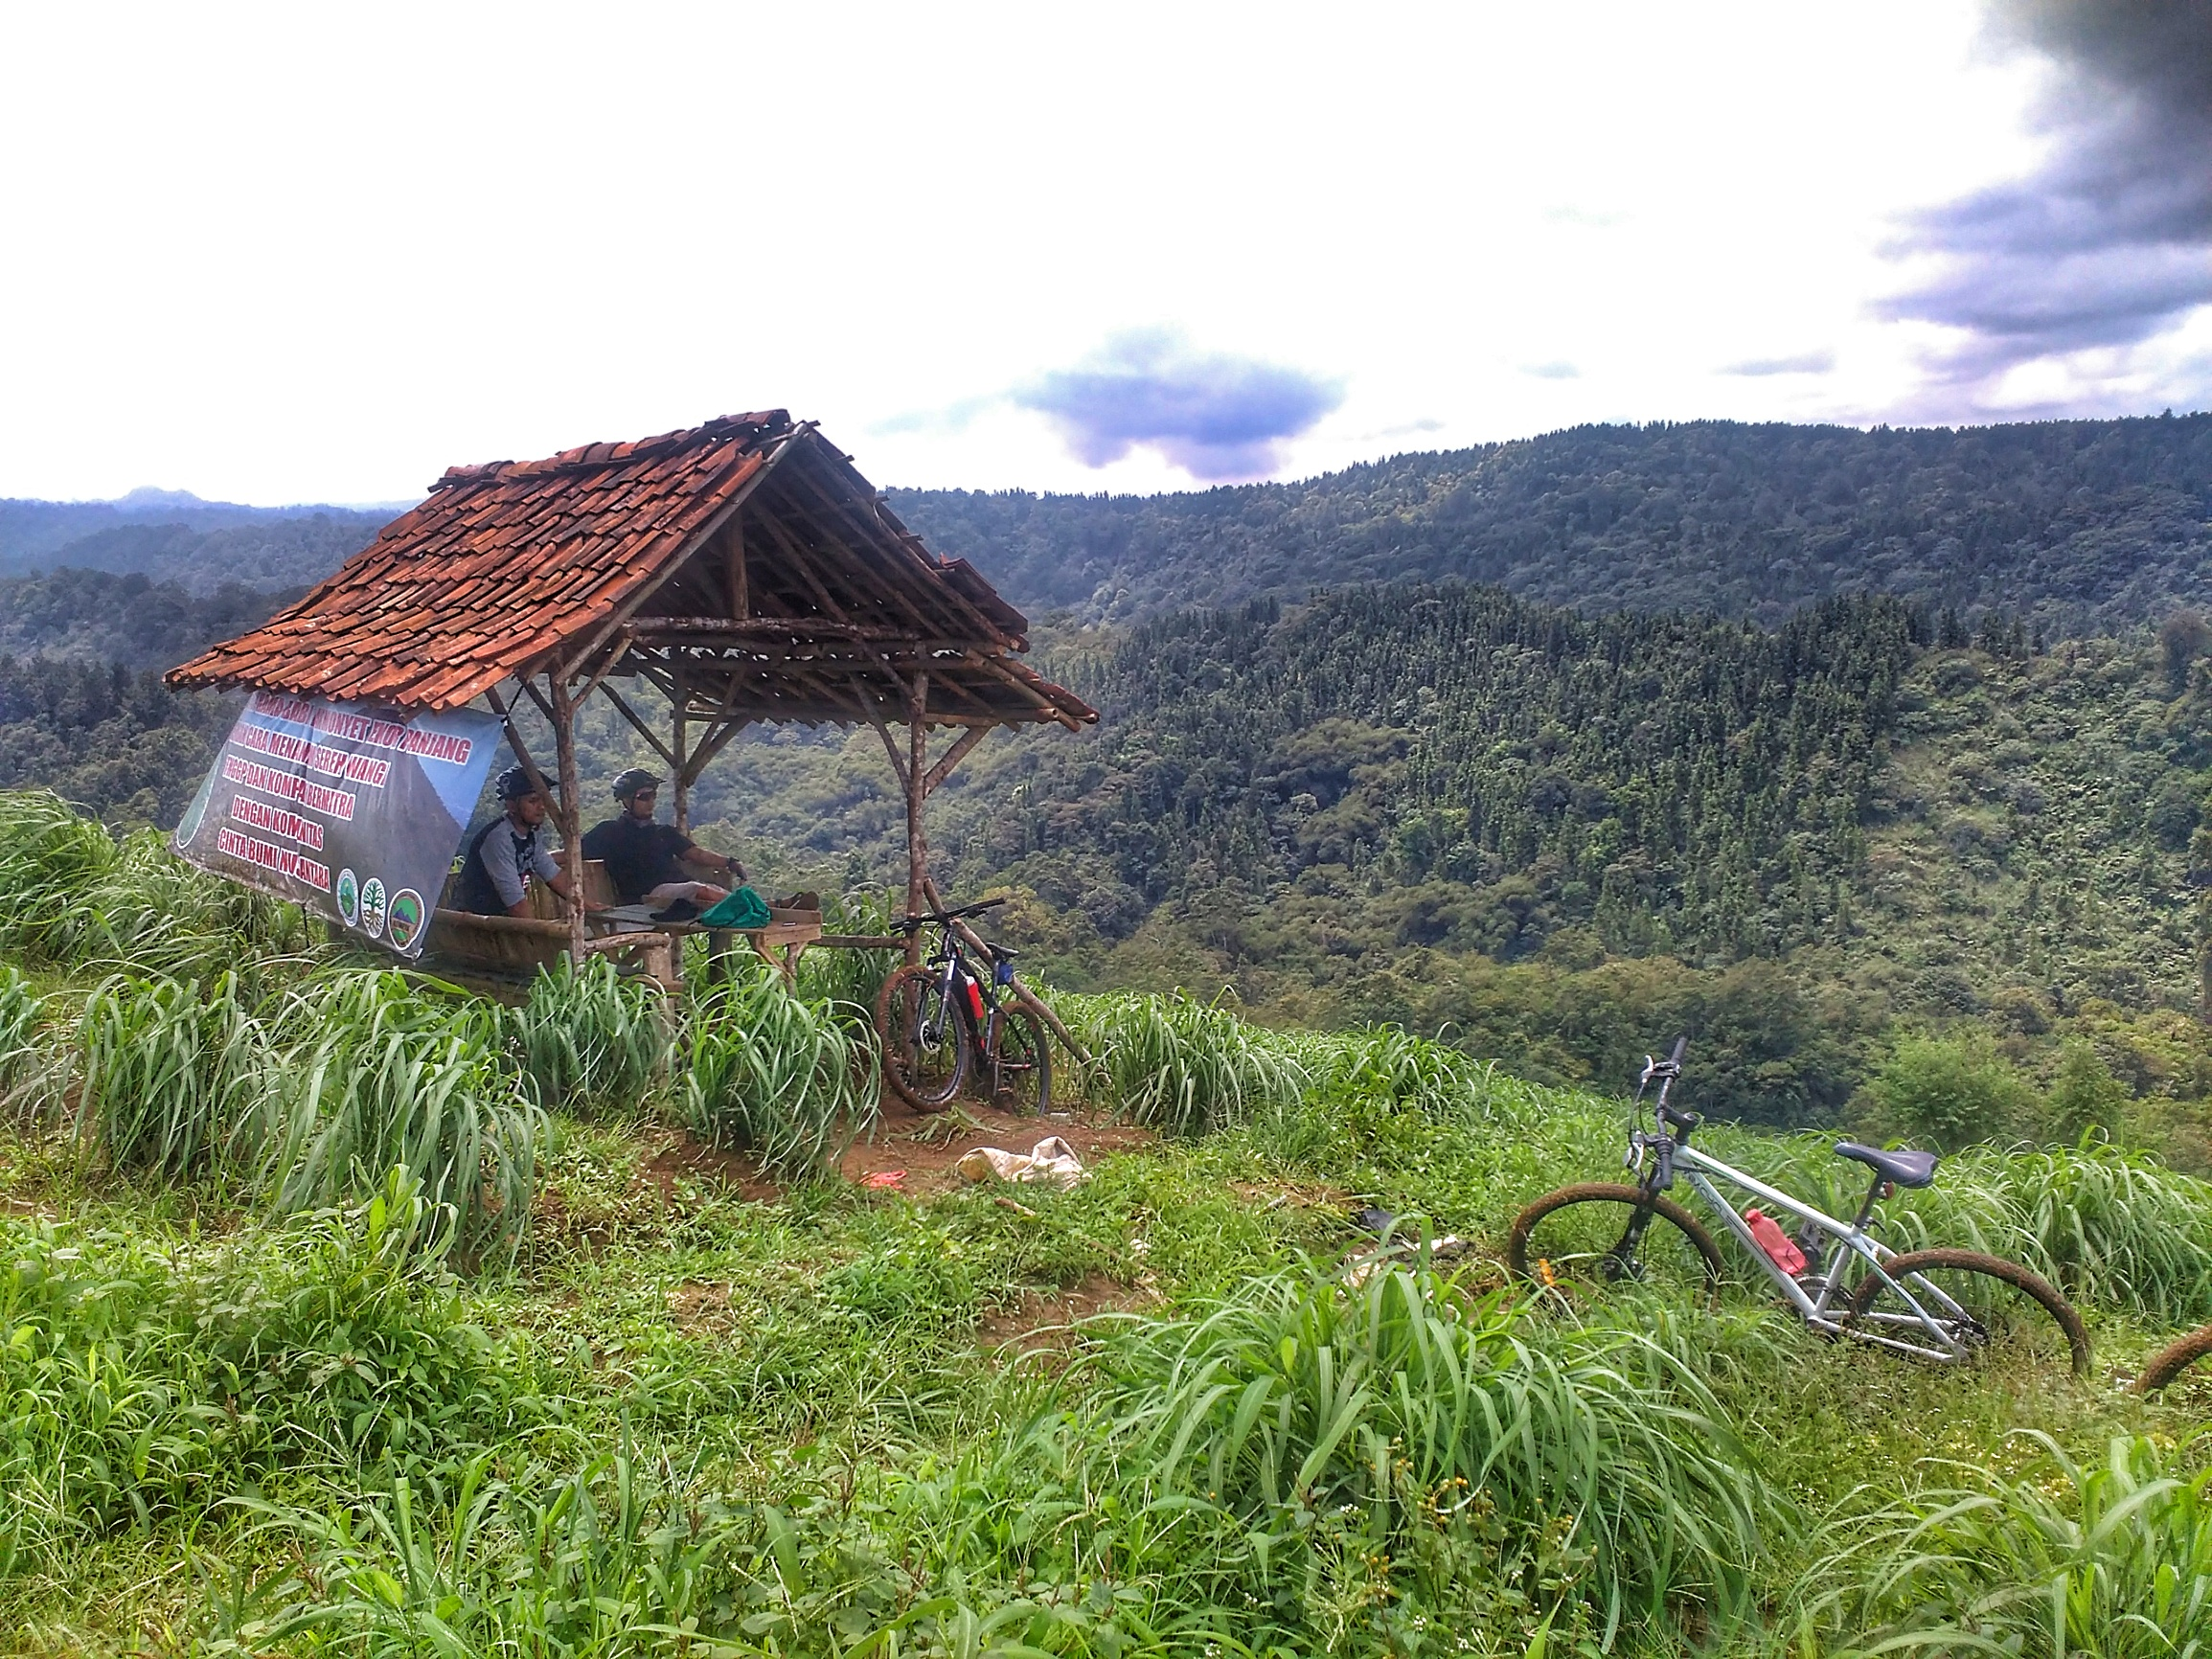 saung di bibir bukit milik petani setempat